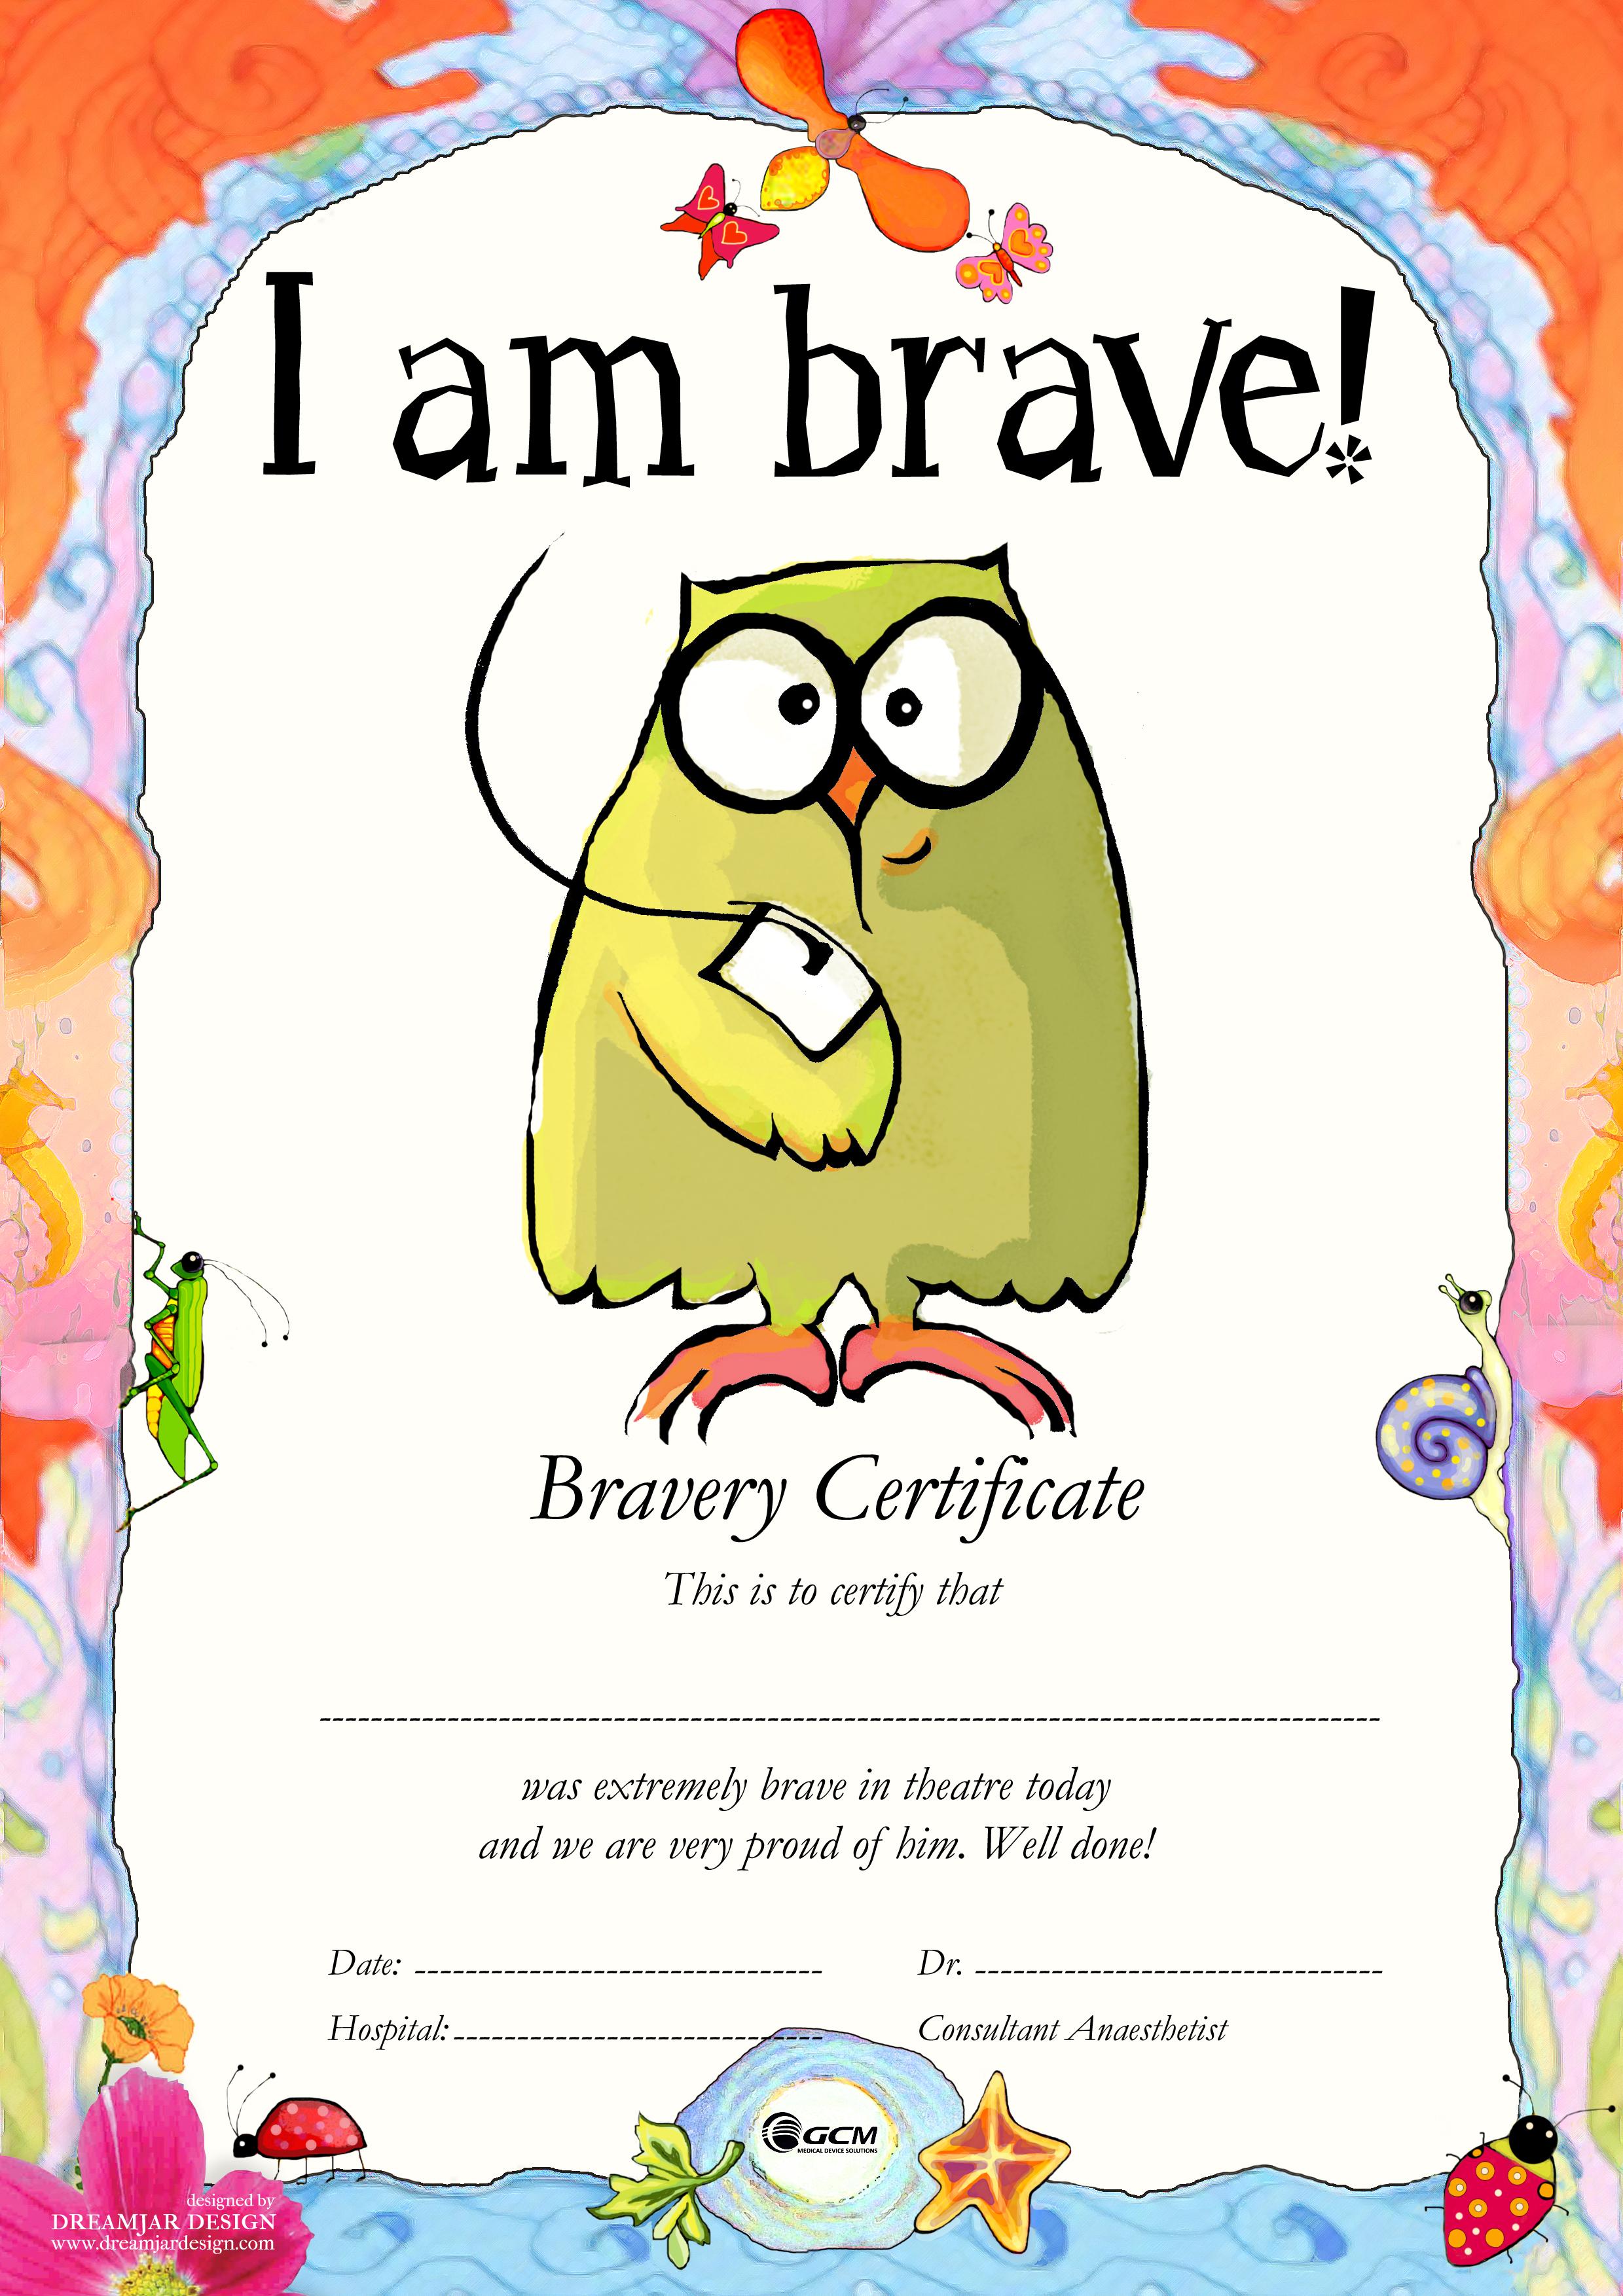 bravery certificate template - blank certificates blank certificate template for kids